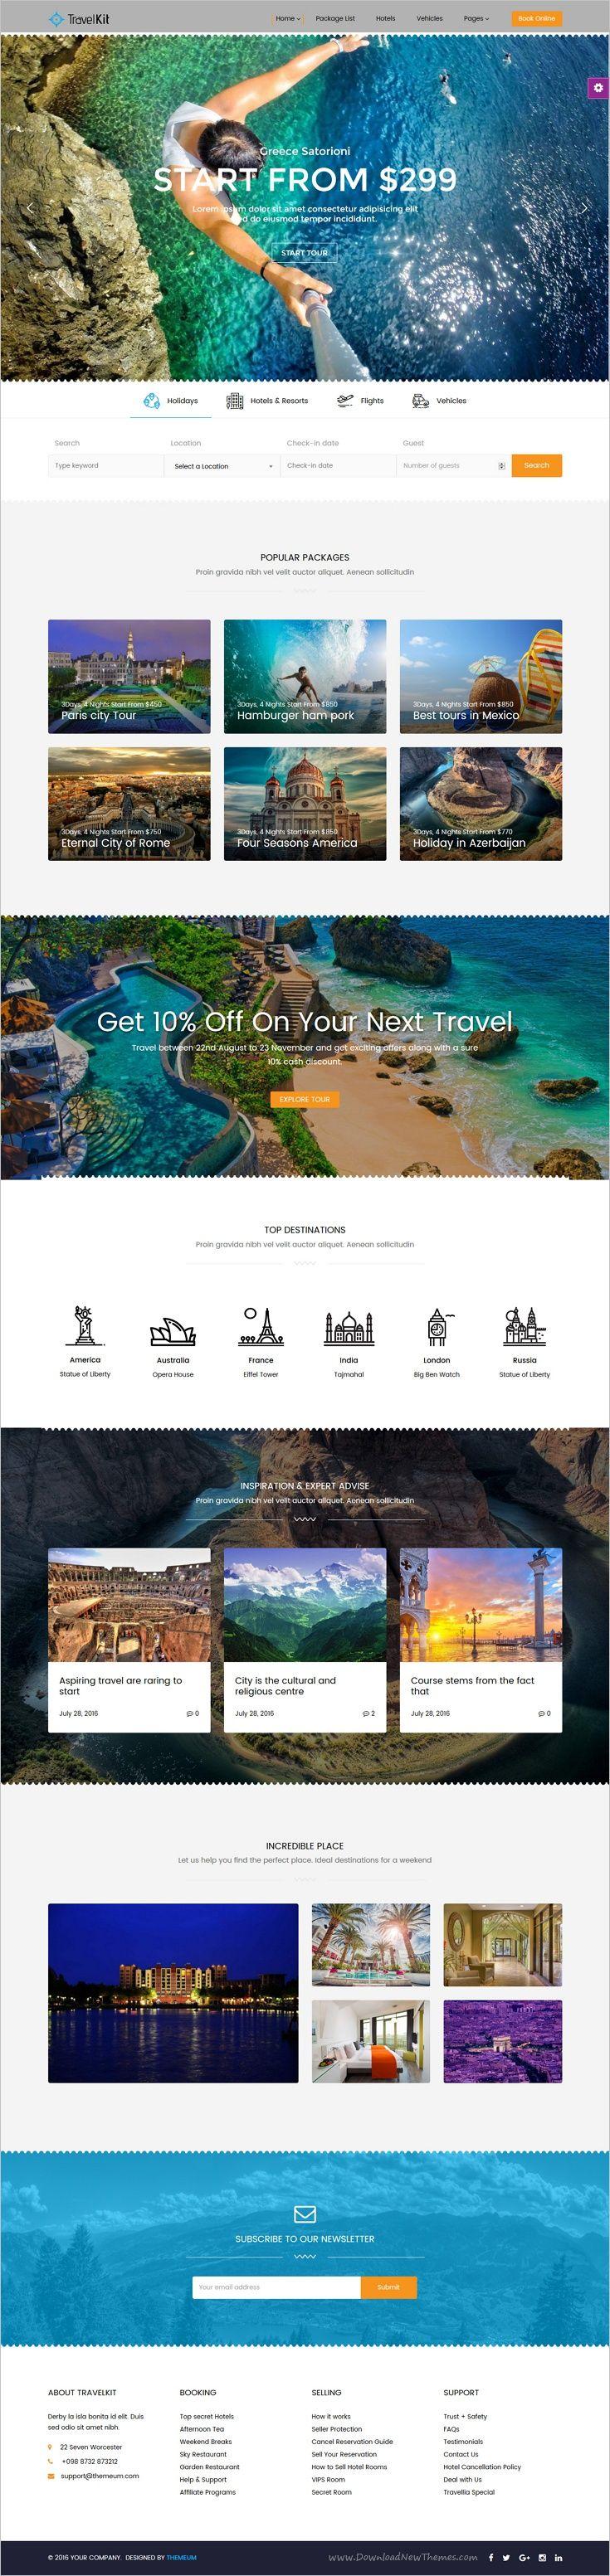 TravelKit is a wonderful responsive #WordPress 5x theme for #webdev the #travel agencies, #tour arrangement companies, tourism sector  website download now➩  https://themeforest.net/item/travelkit-the-fullfledged-tour-travel-wordpress-theme/18443964?ref=Datasata